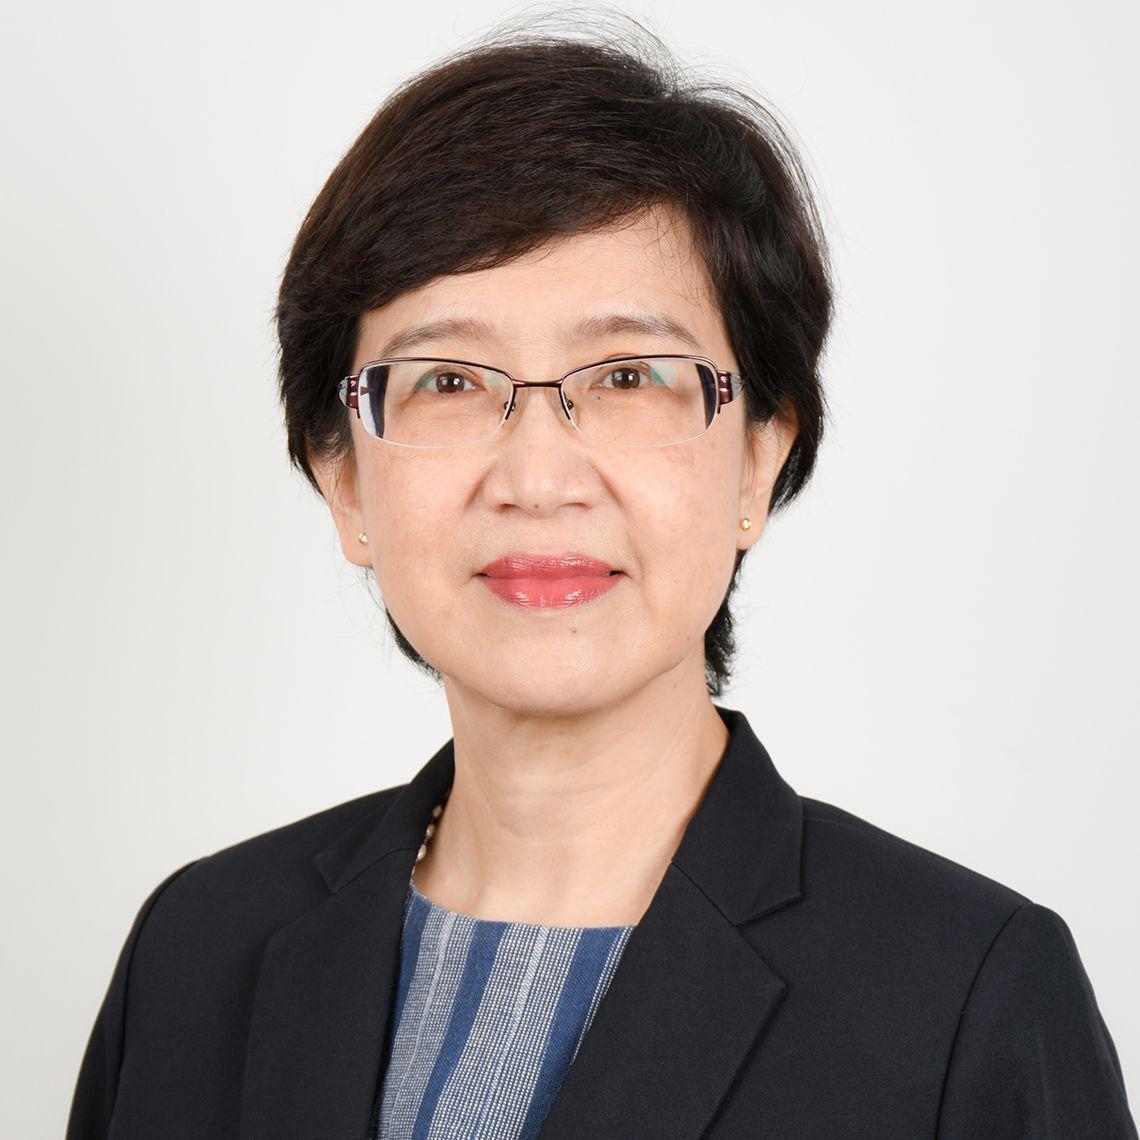 Dr Piengchan Sonthayanon